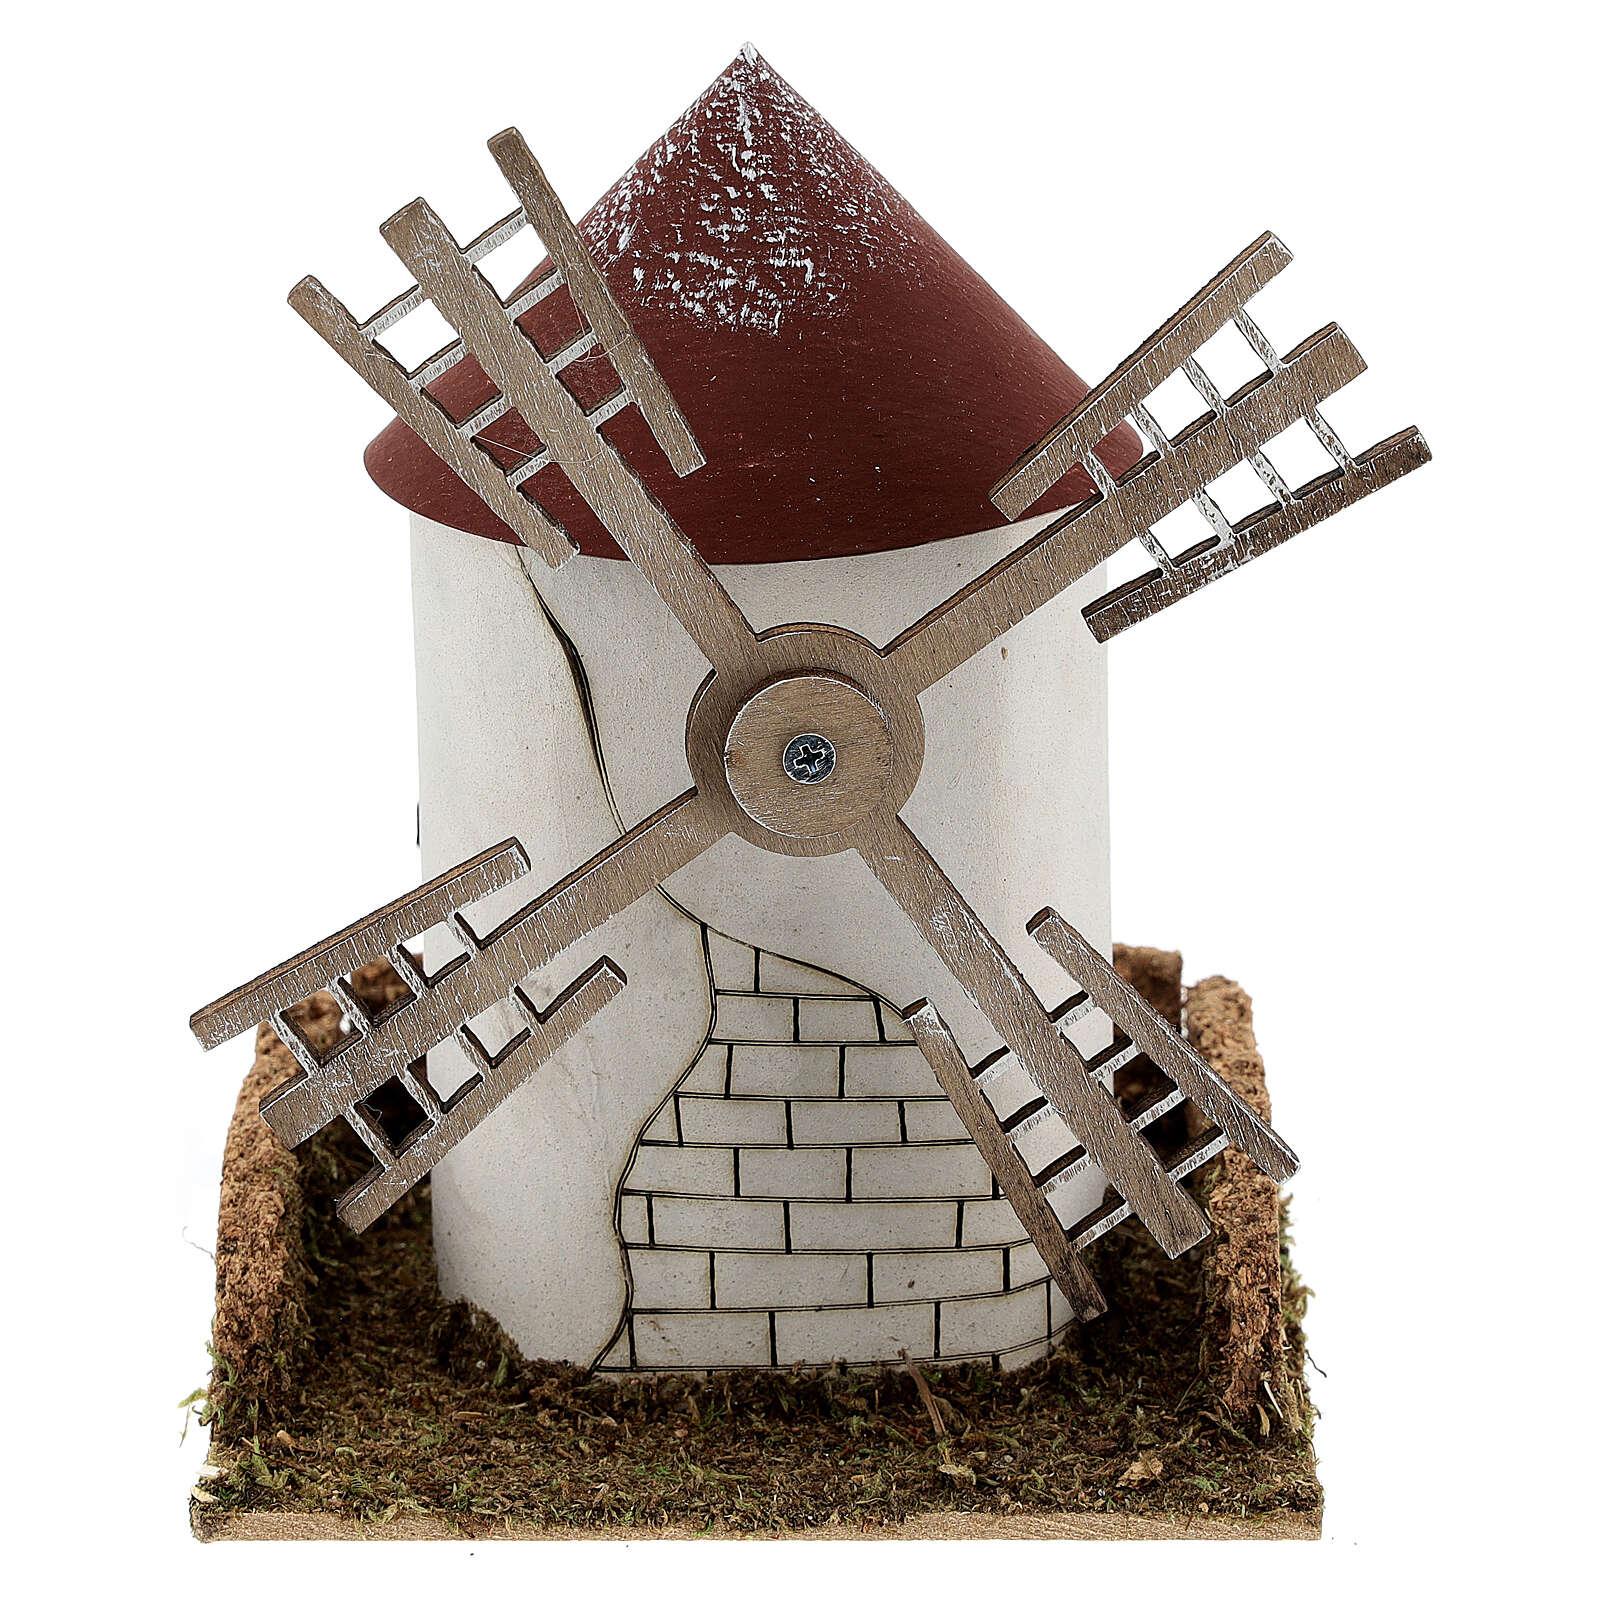 Windmill with working Flemish blade 20x15x16 cm, 4-6 cm Nativity Scenes 4